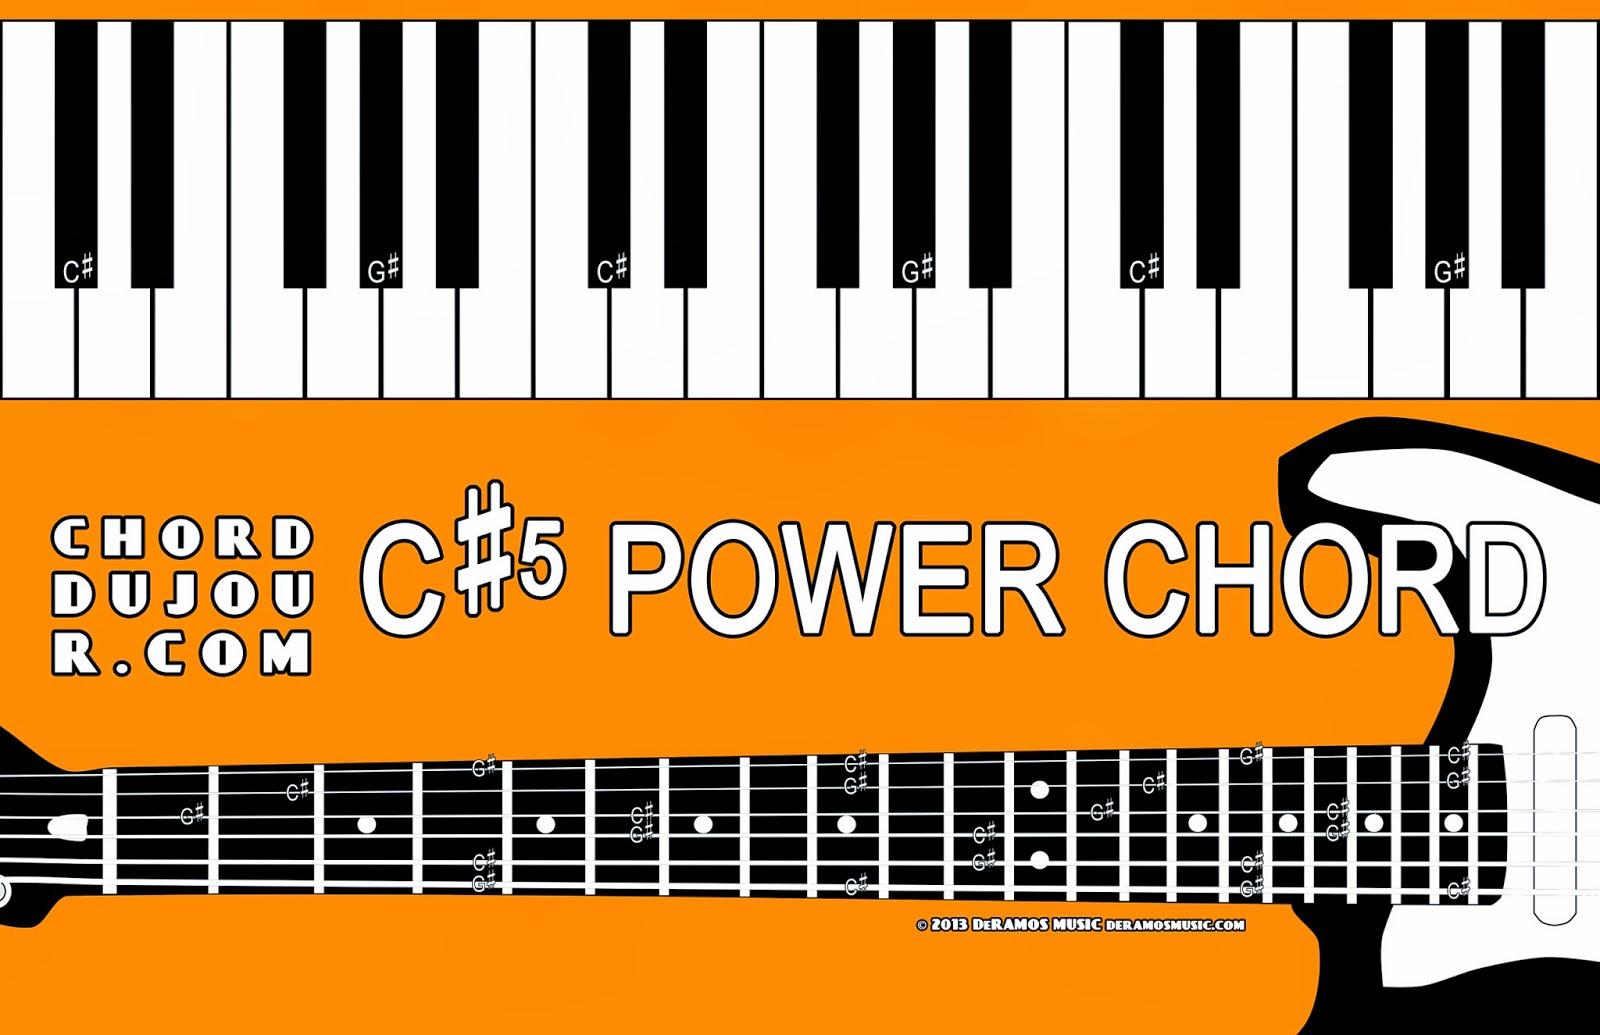 Chord du jour dictionary c5 power chord dictionary c5 power chord hexwebz Choice Image